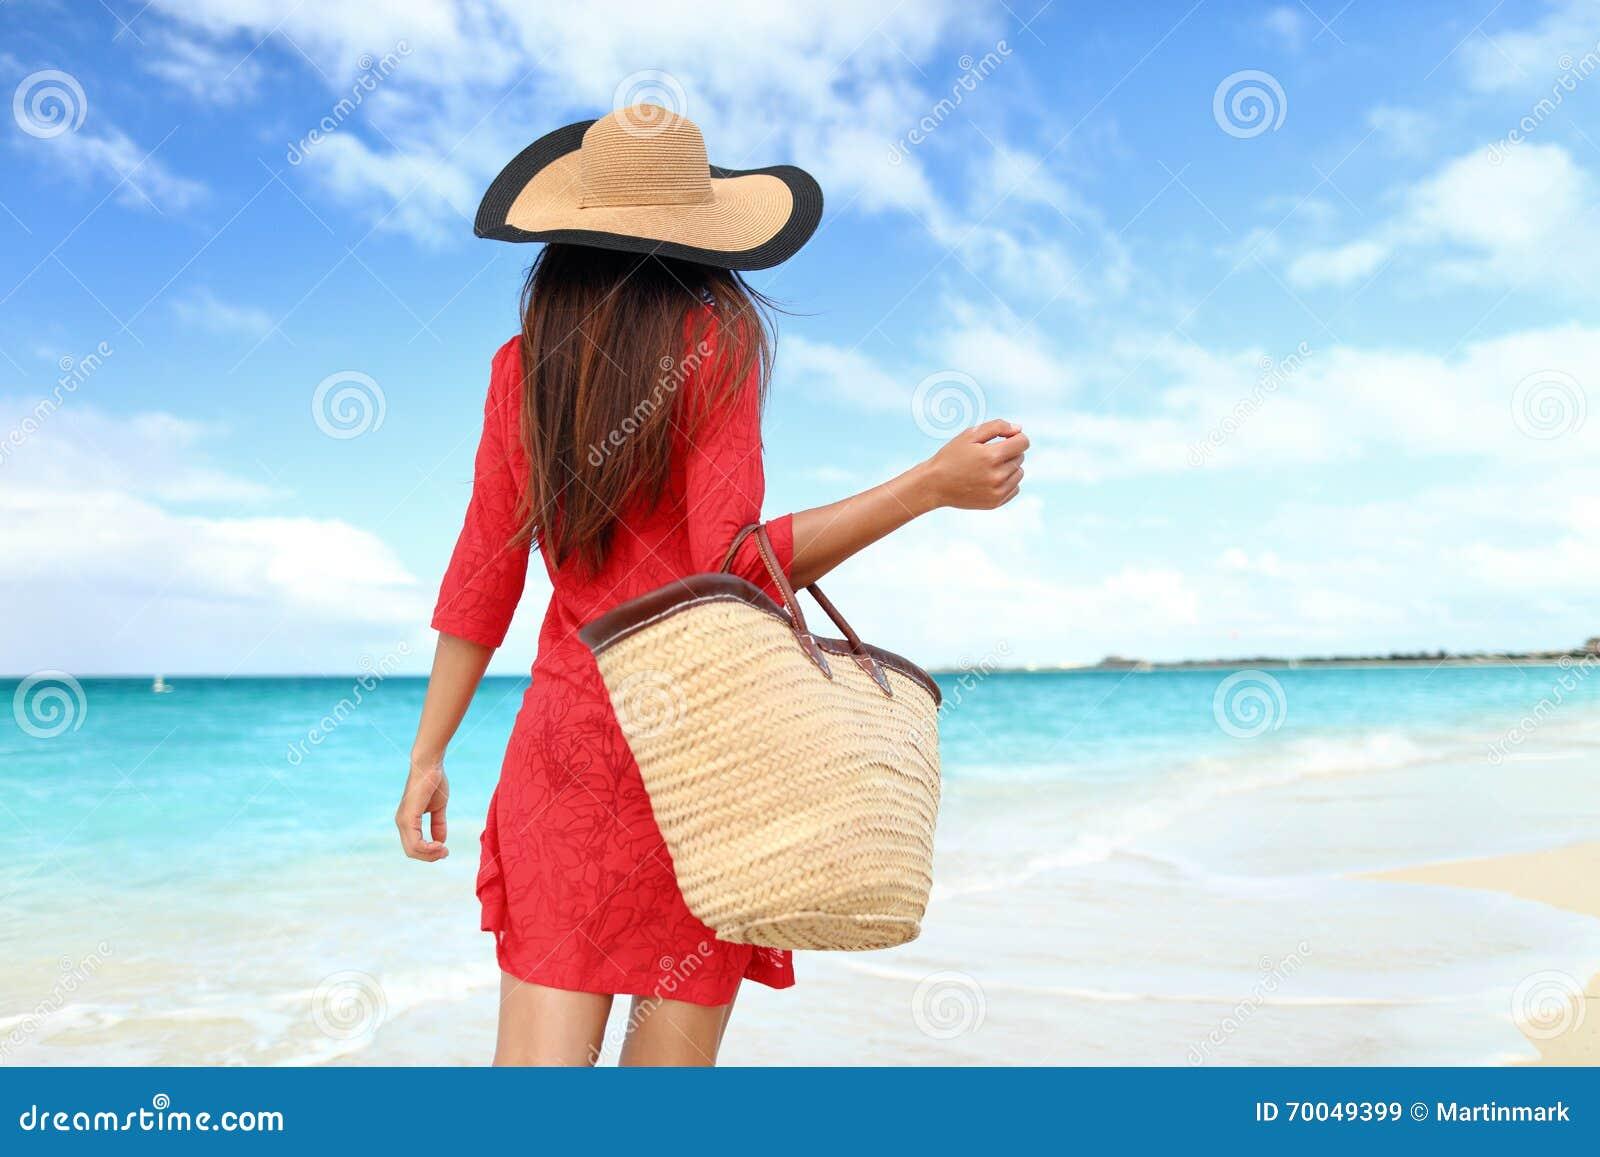 Woman tourist walking on tropical summer vacation wearing sun hat d28c8552d92